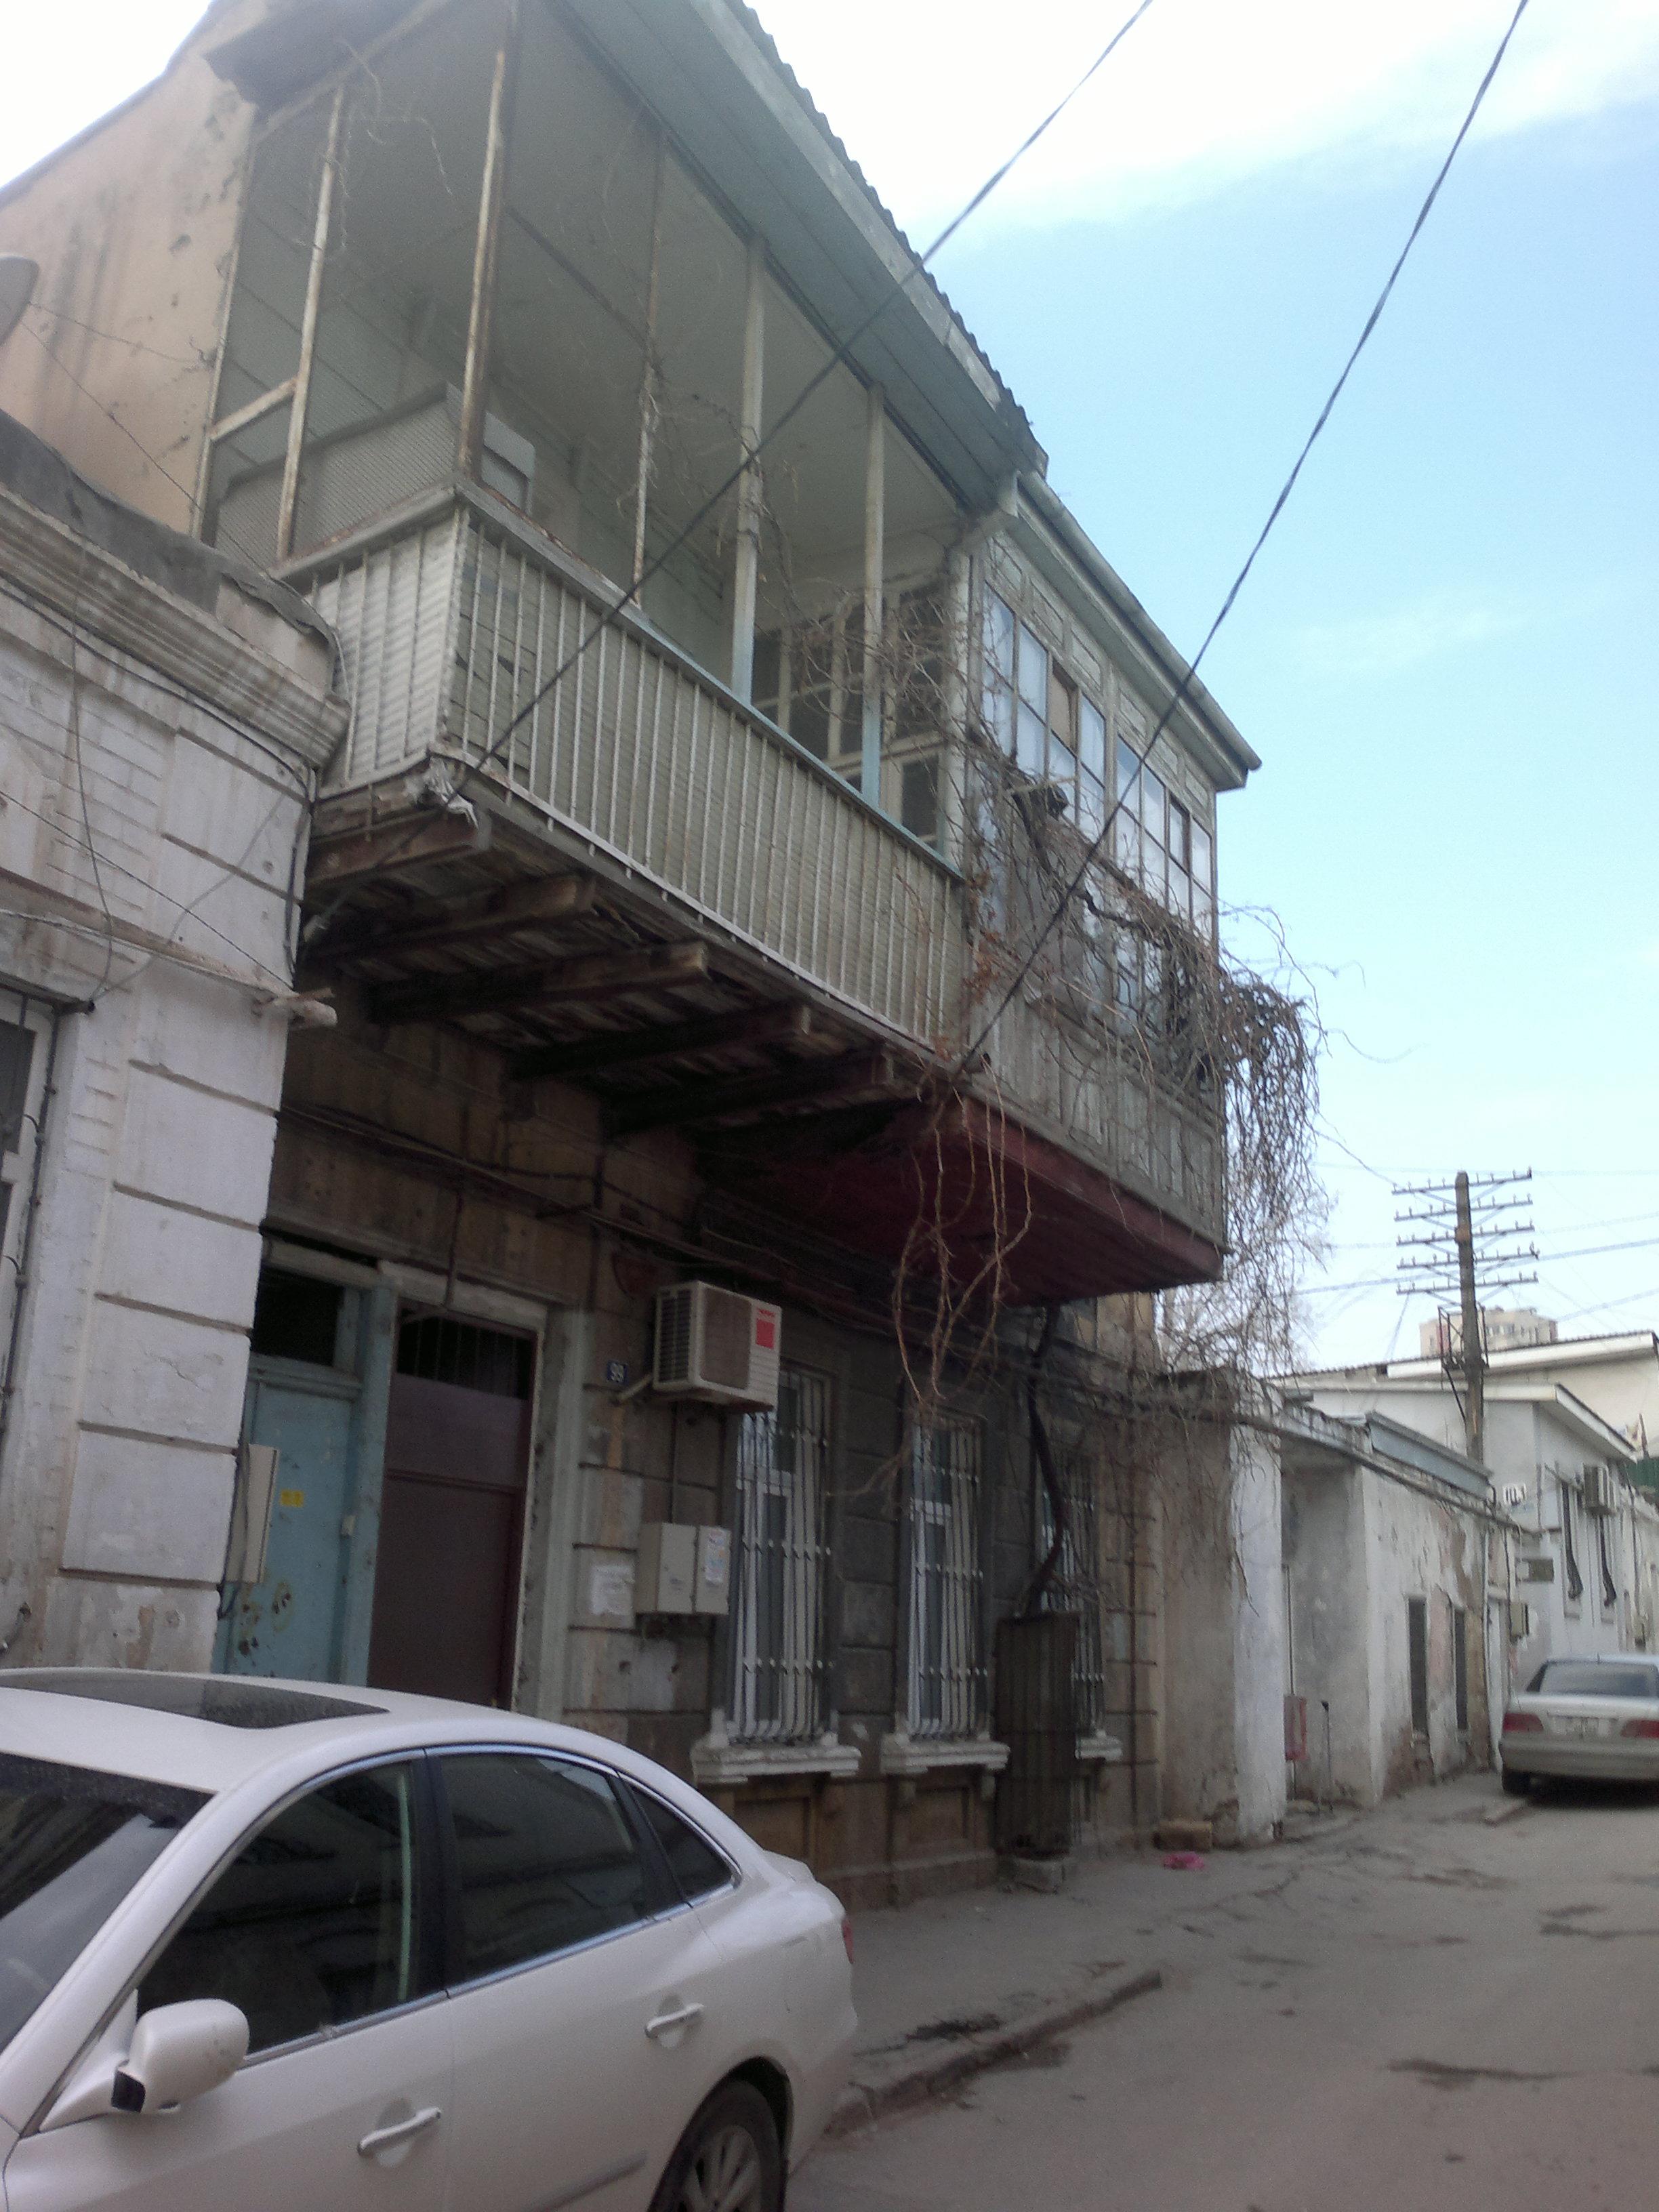 FileBuilding On Nabat Ashurbeyova Street 99